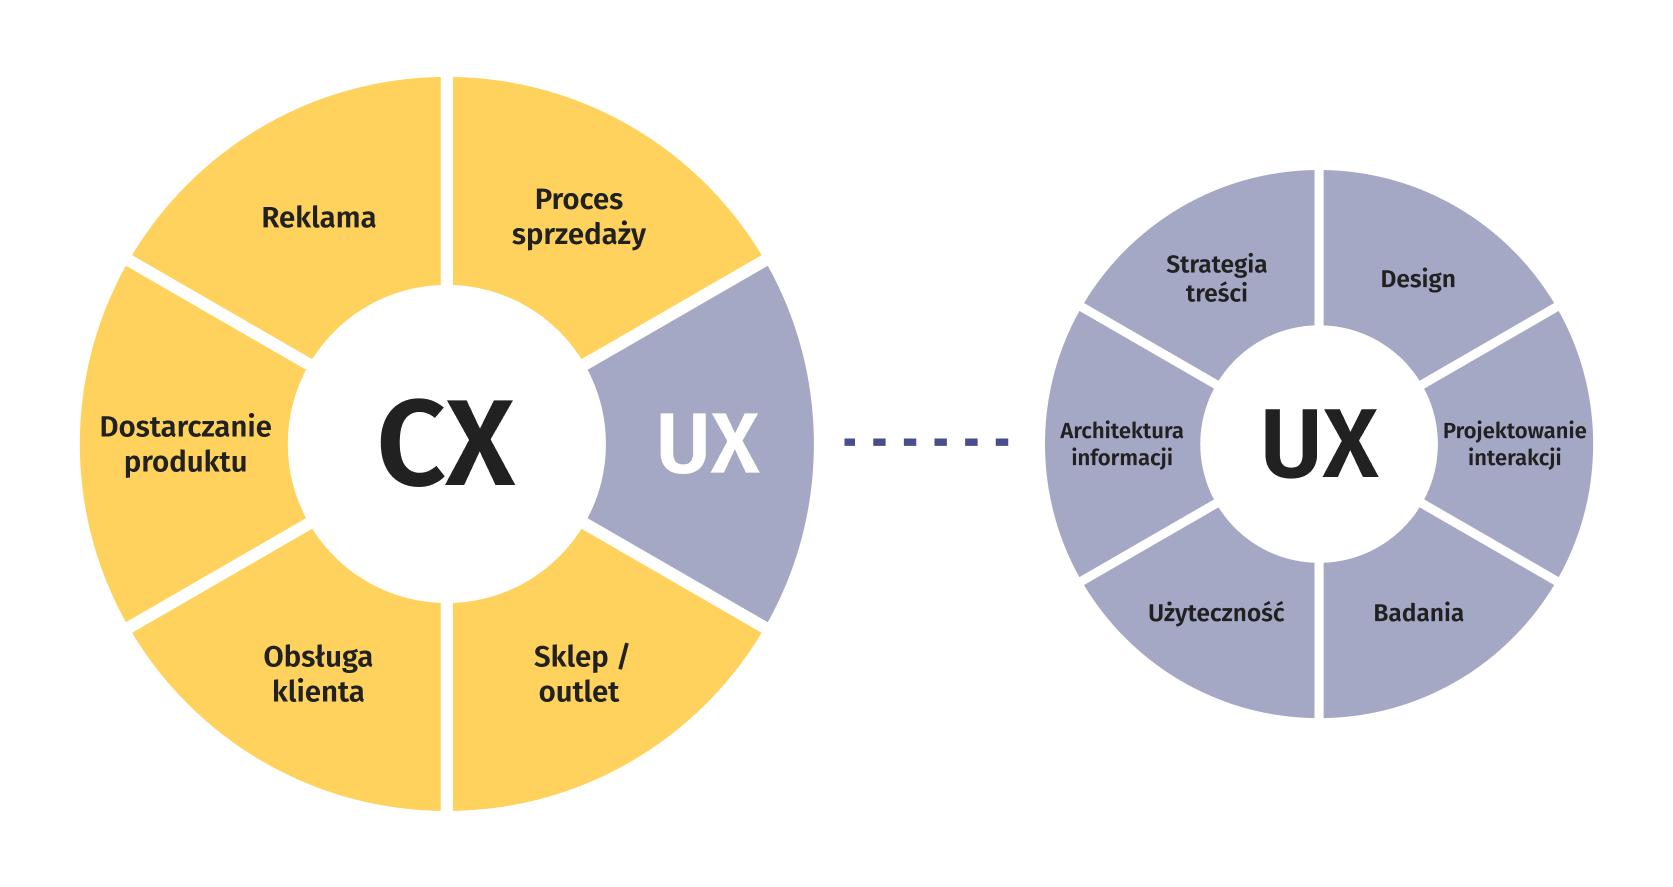 Różnica między UX a Customer Experience